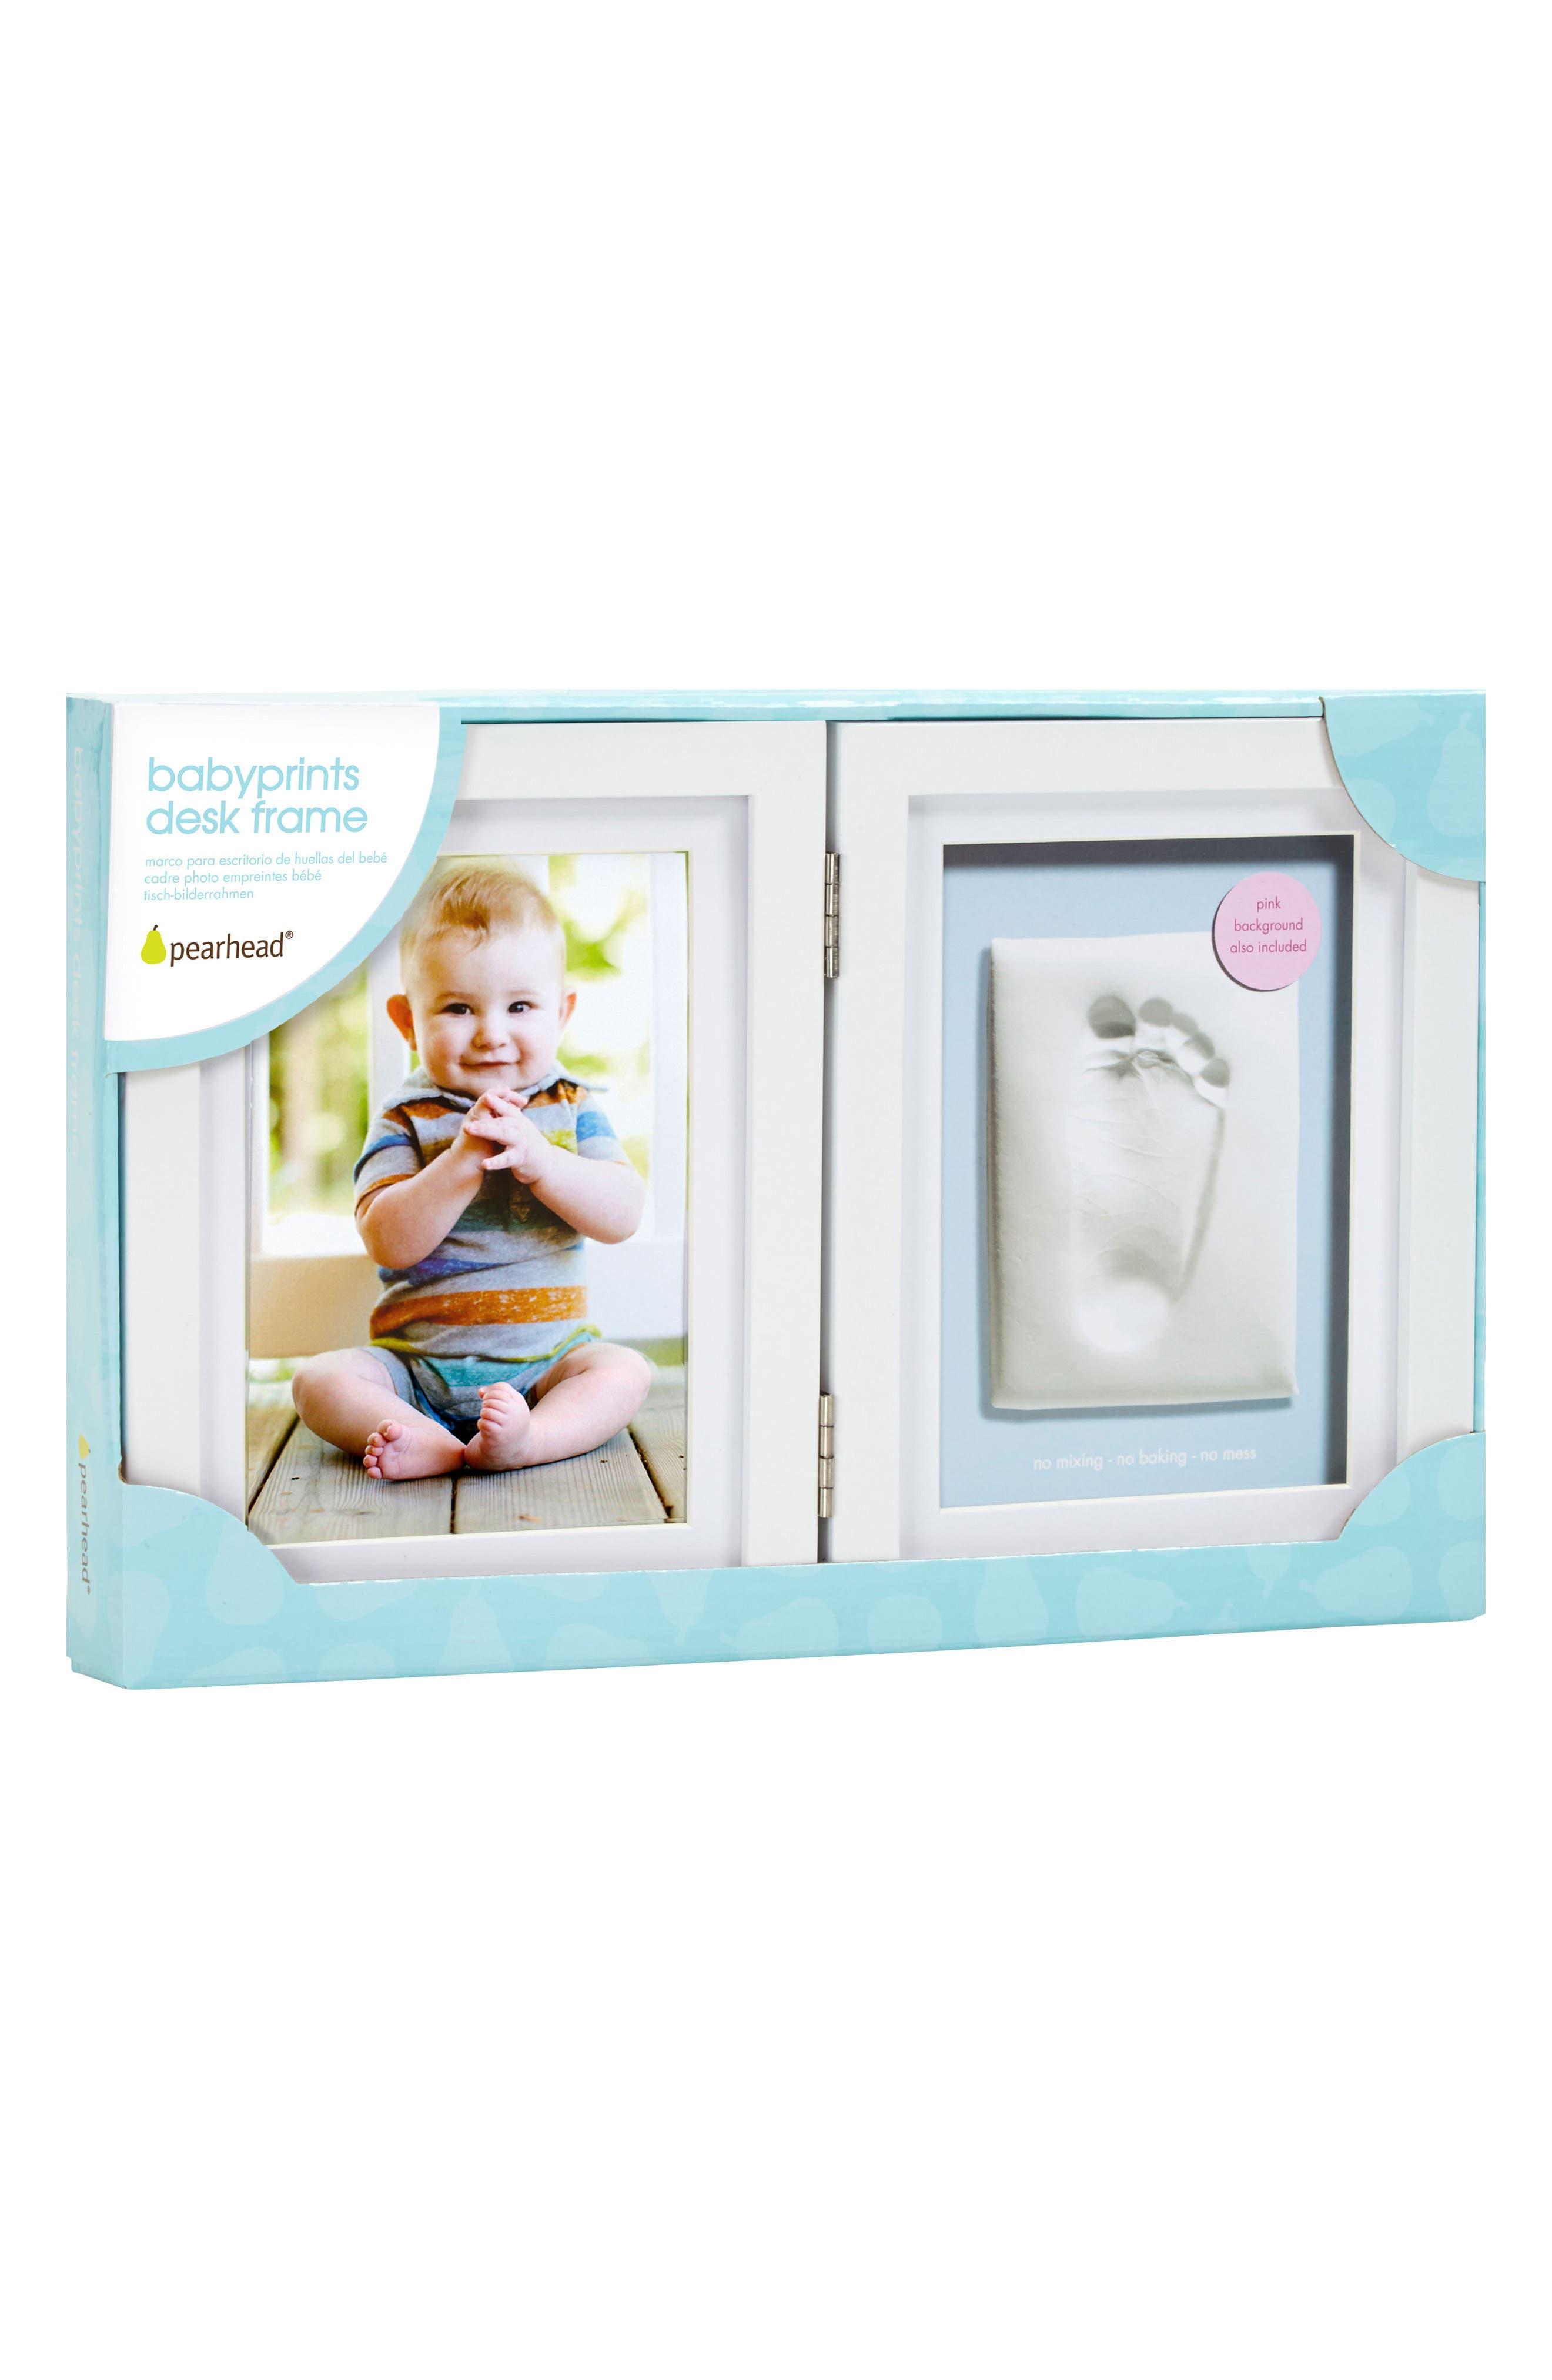 Main Image - Pearhead Babyprints Desk Frame